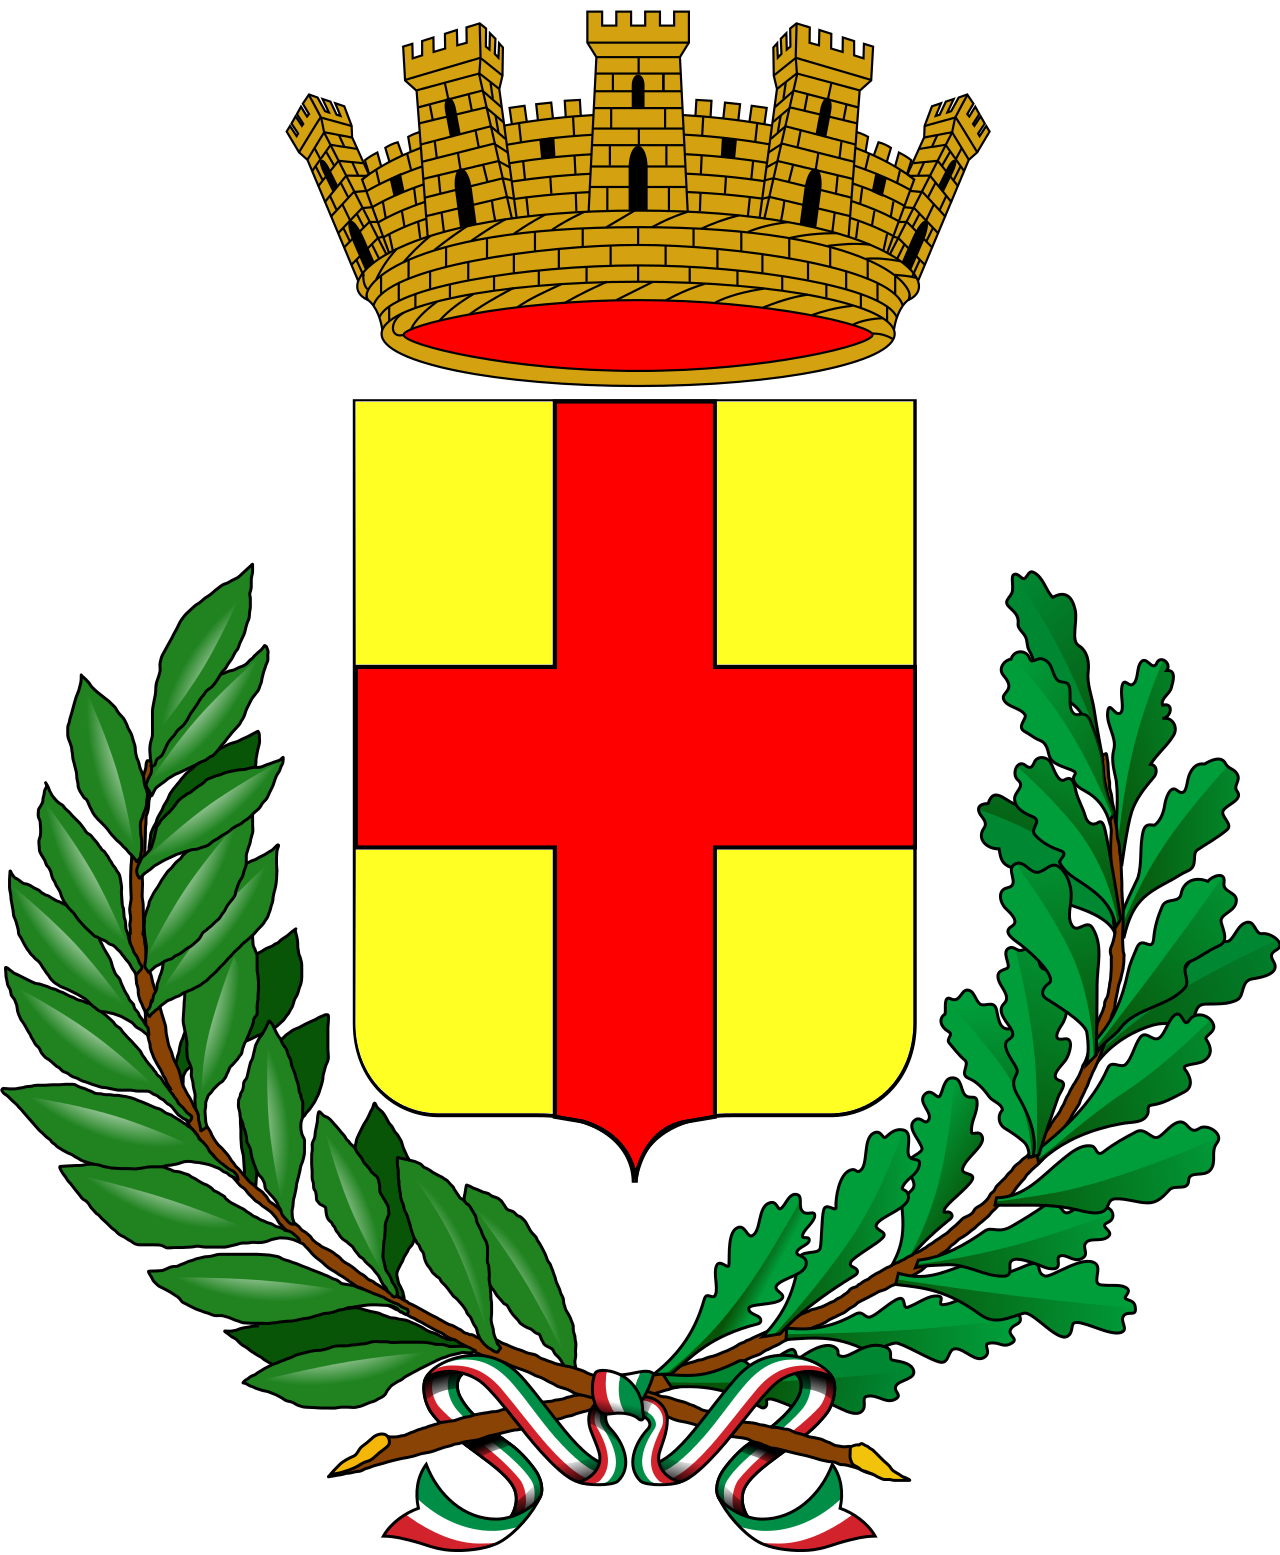 upload.wikimedia.org/wikipedia/commons/5/5a/CoA_Comune_di_Albenga.png